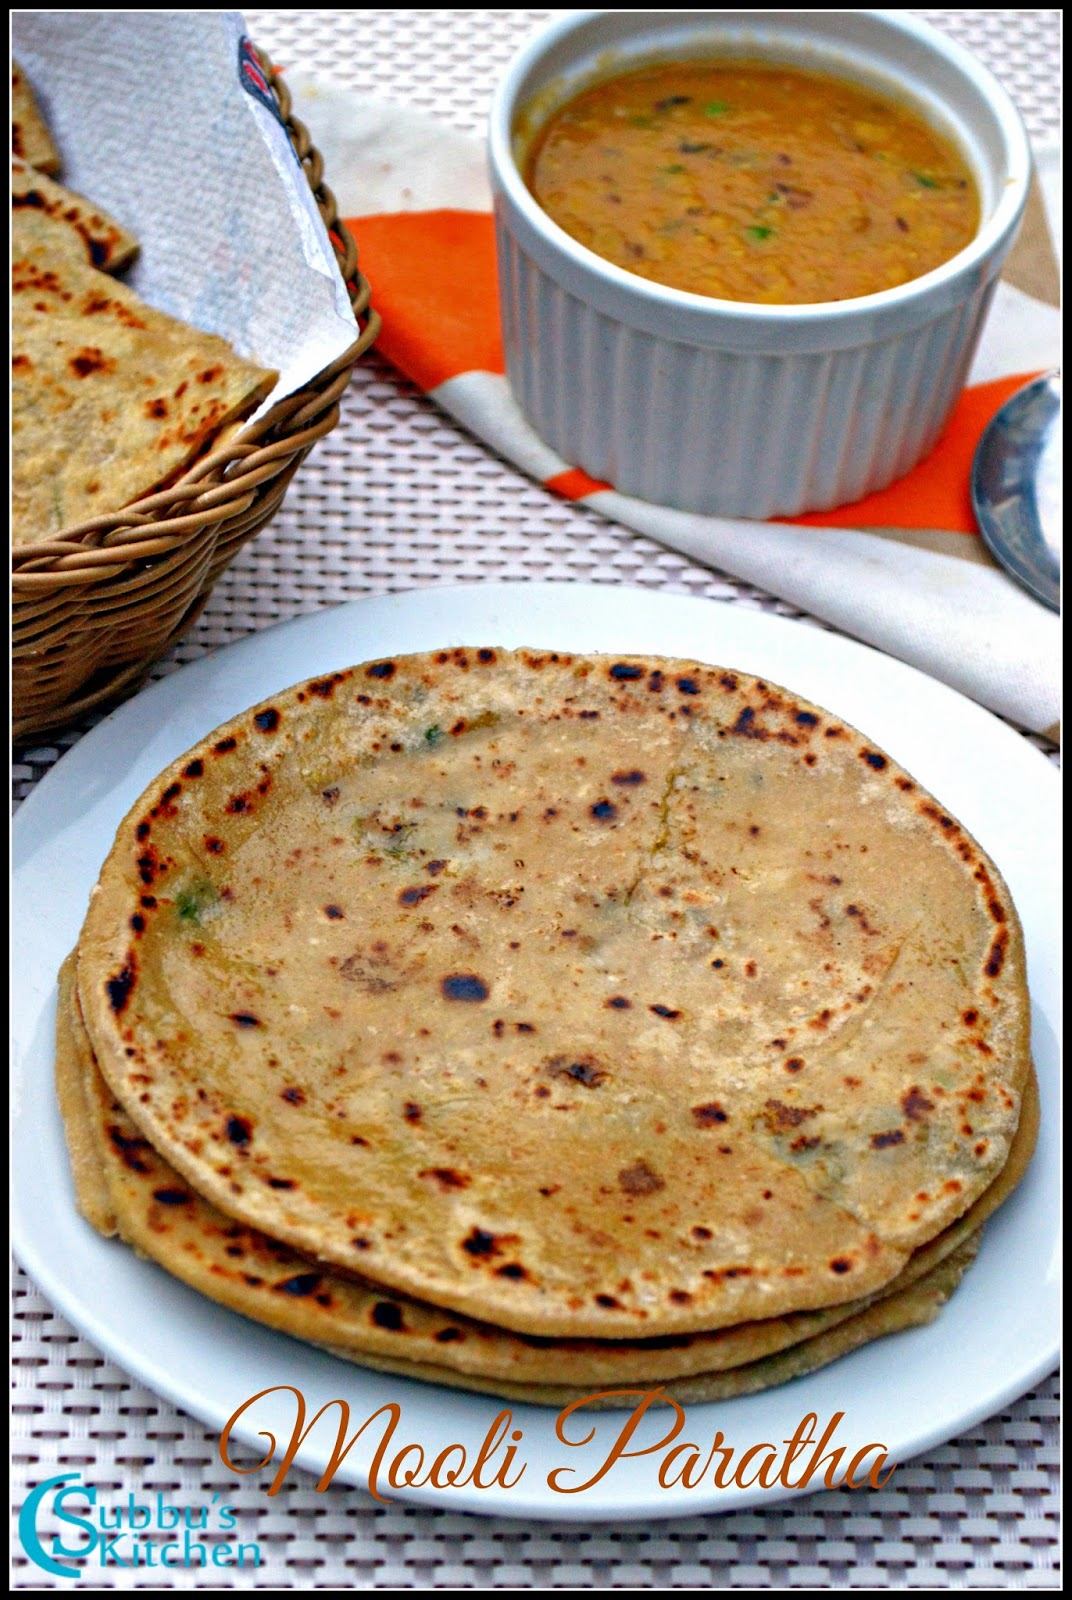 Mooli Paratha Recipe | Radish Paratha Recipe